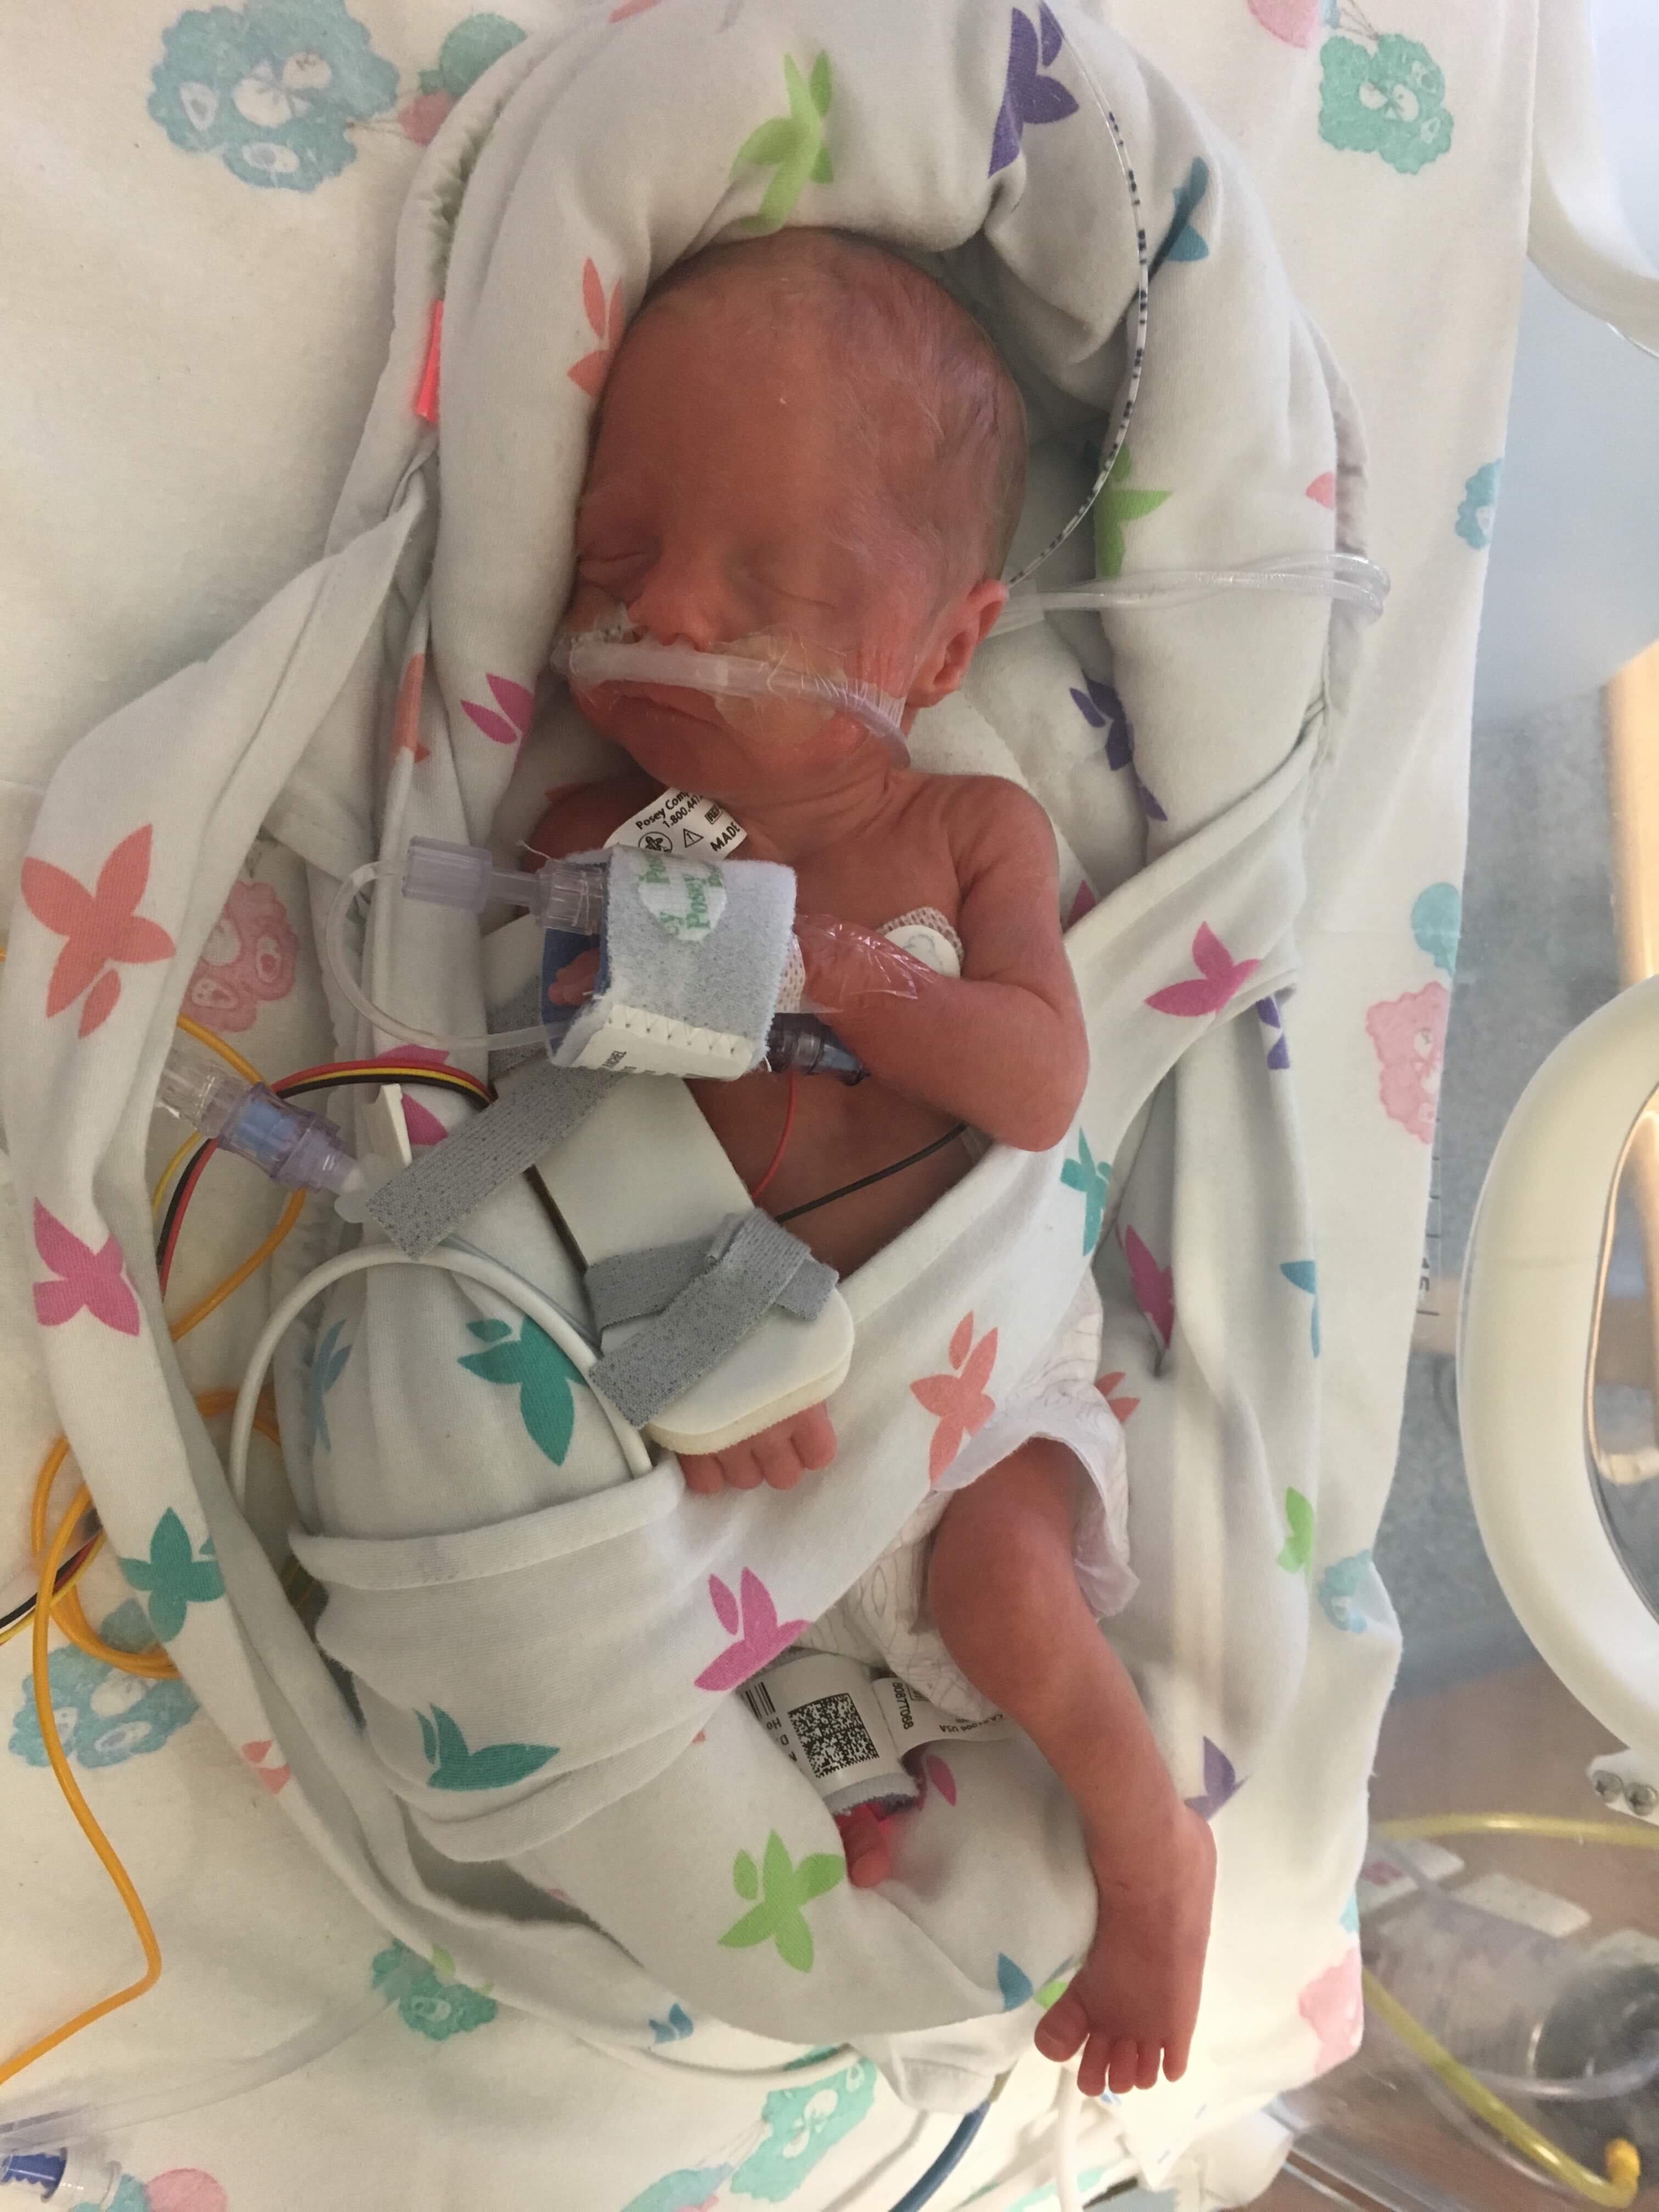 Baby Ocean Grace in hopsital. Credit: MEN Media